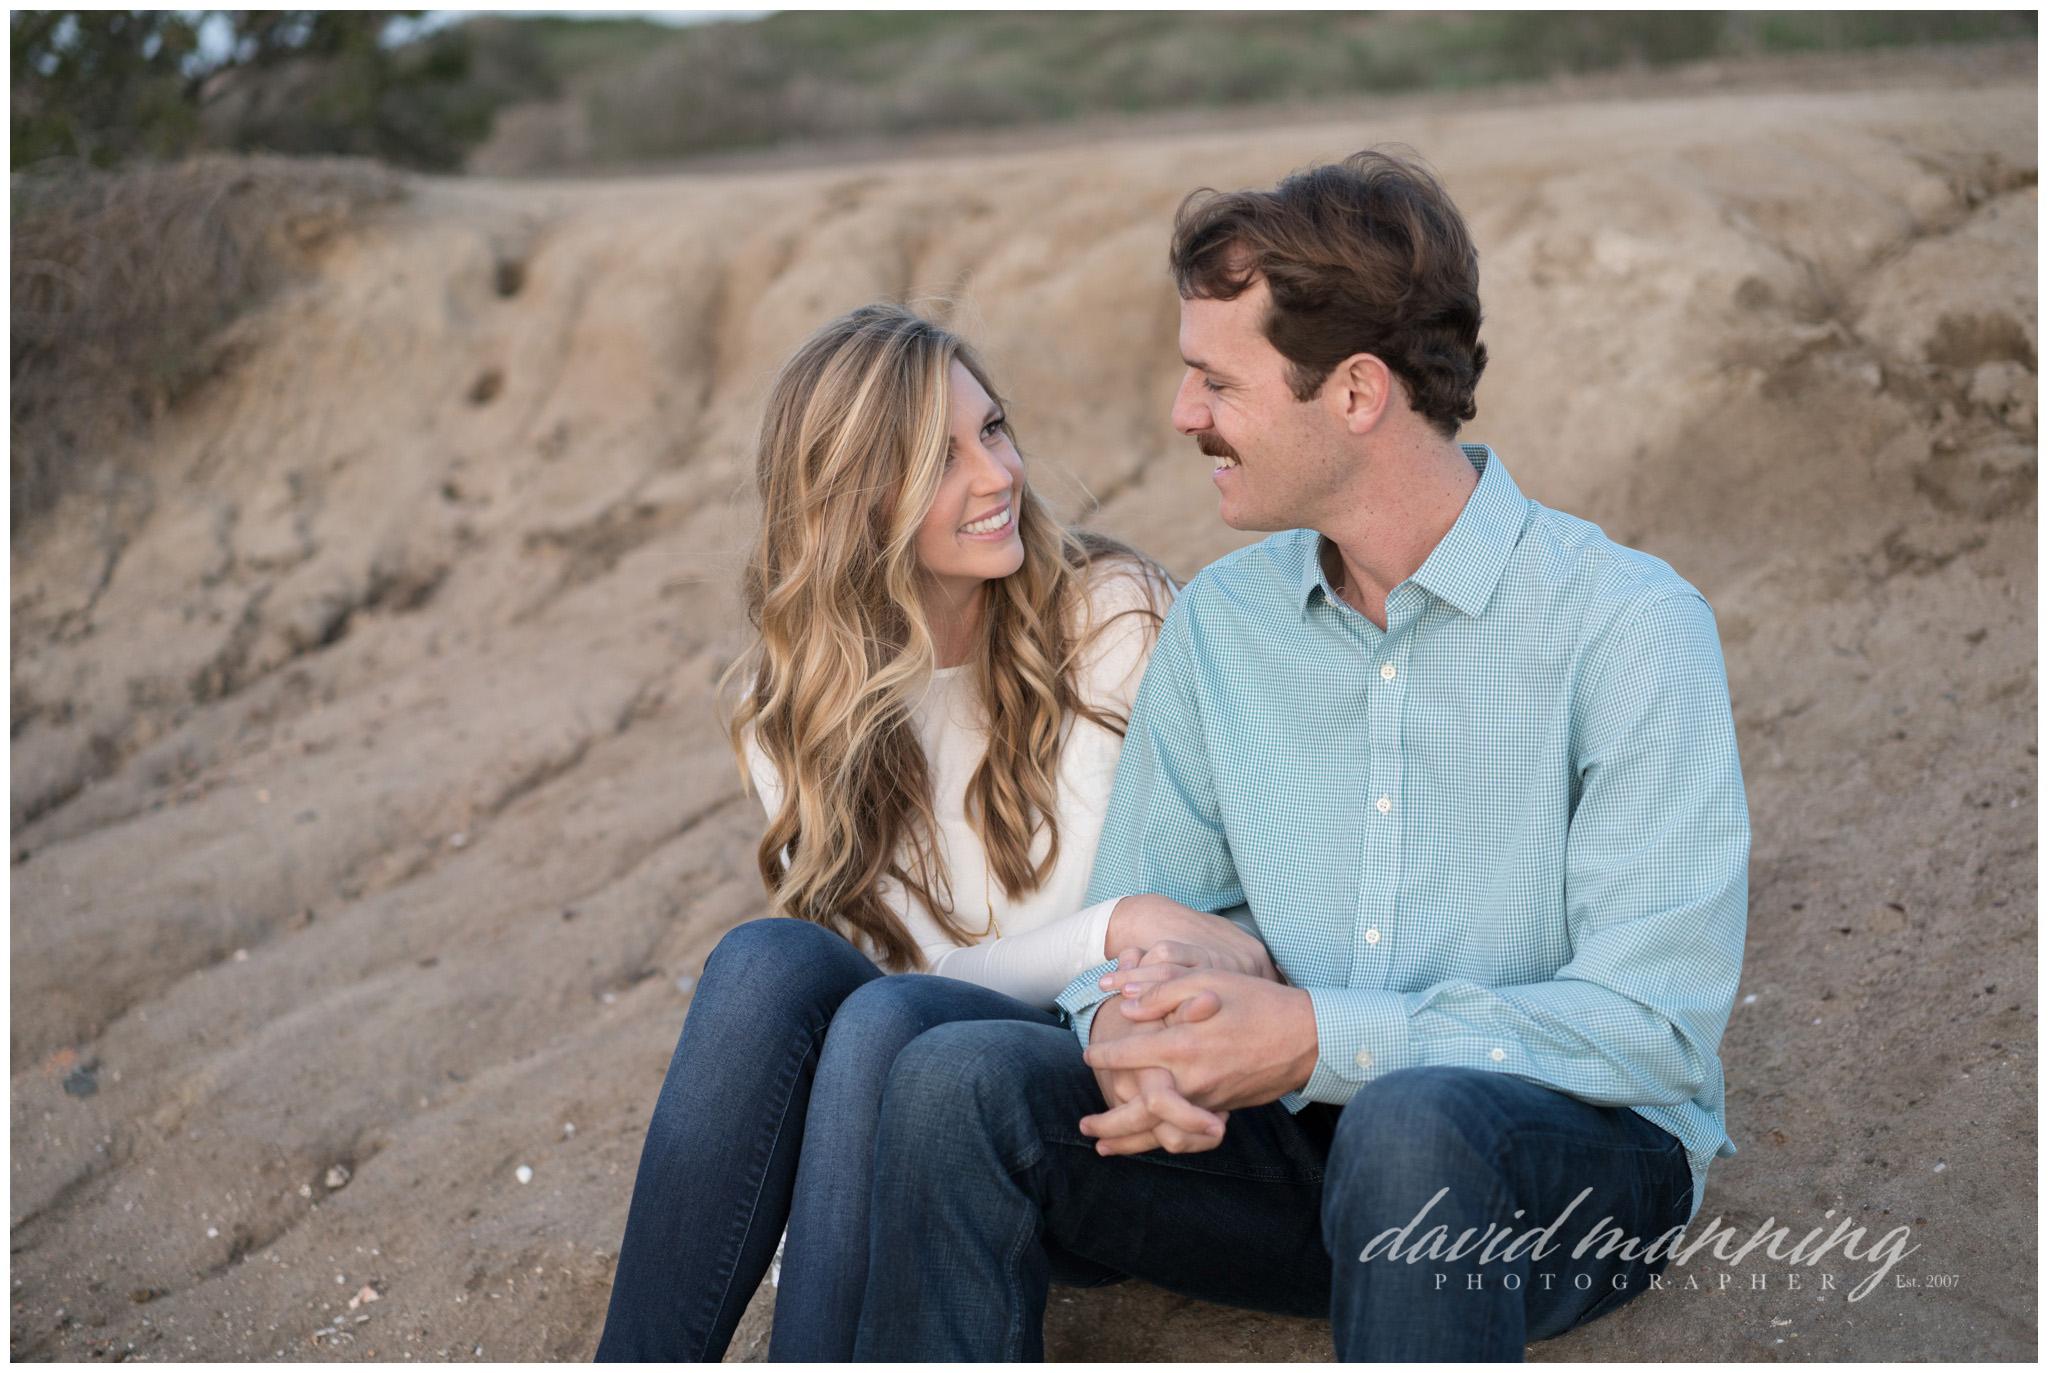 Alyssa-Taylor-Engagement-David-Manning-Photographer-0153.JPG